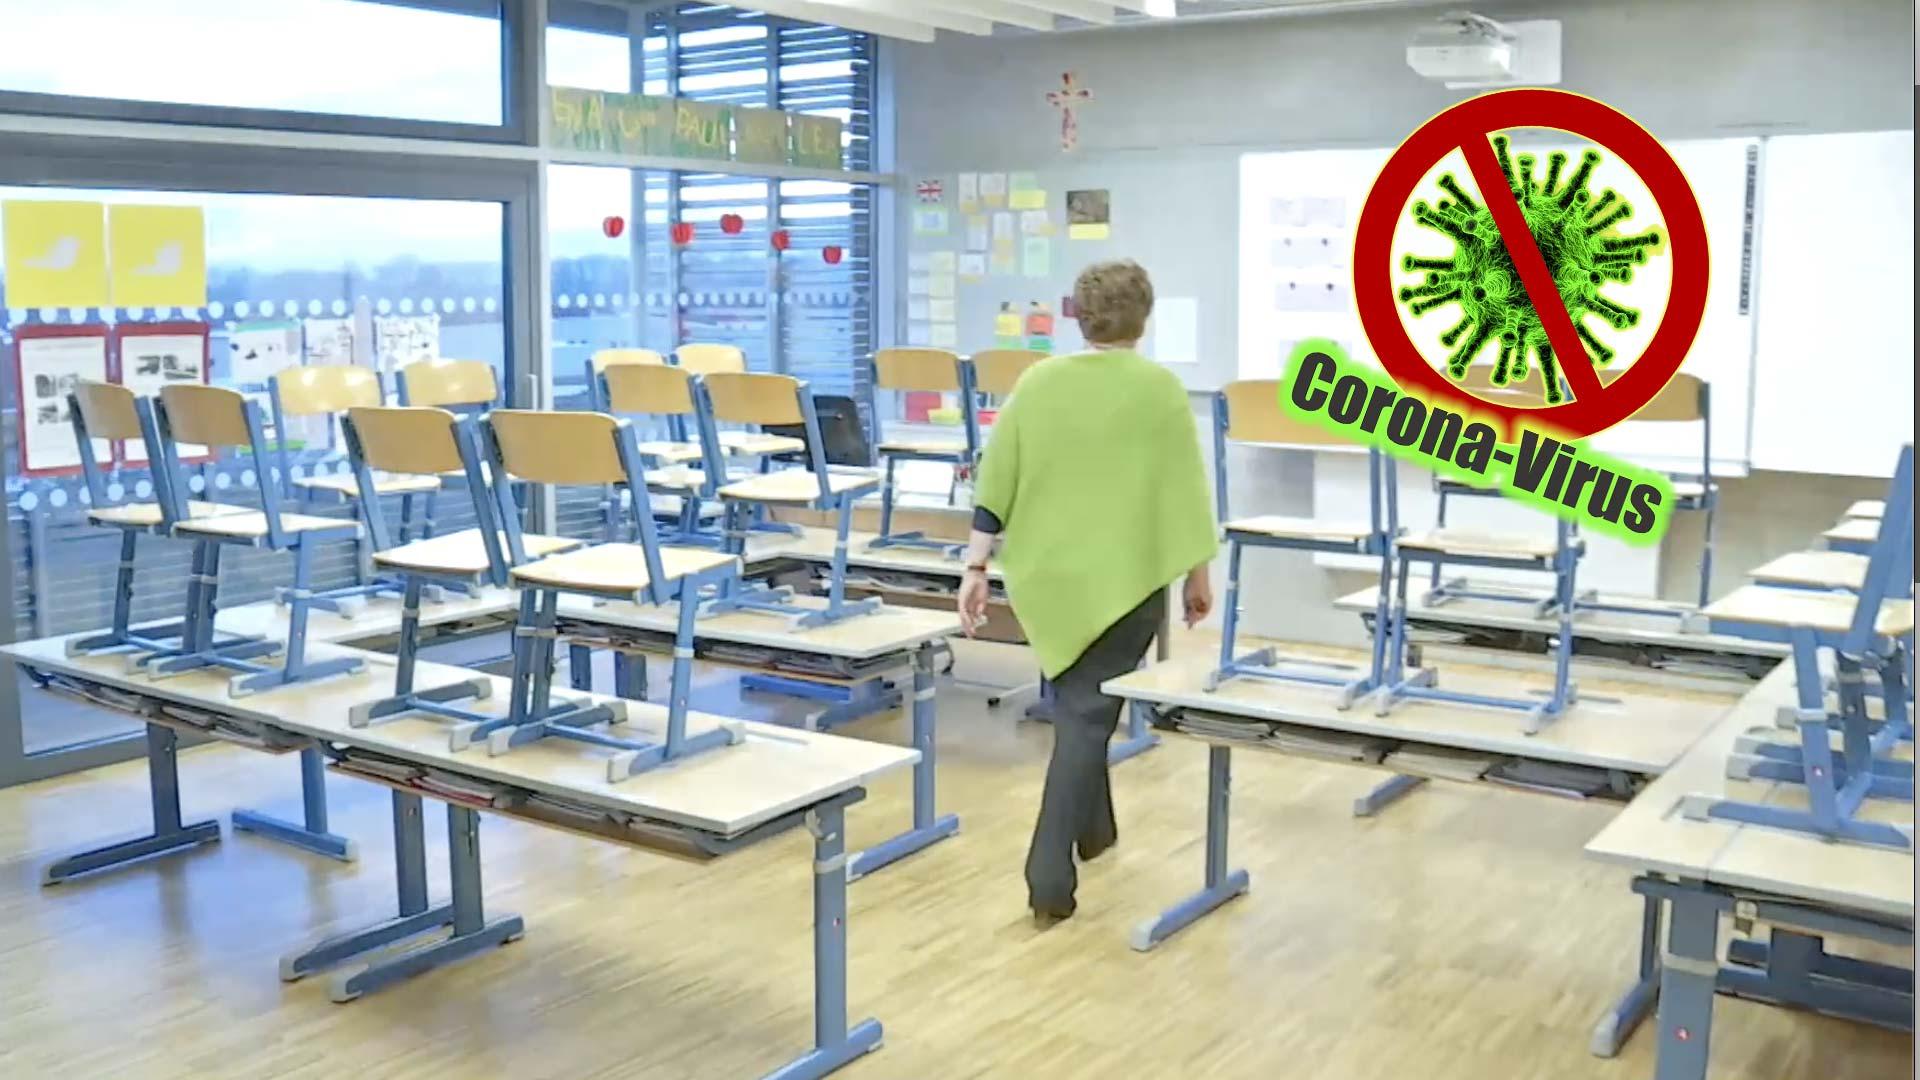 """Schüler sollen ab Montag zuhause bleiben"" - LT1 ..."